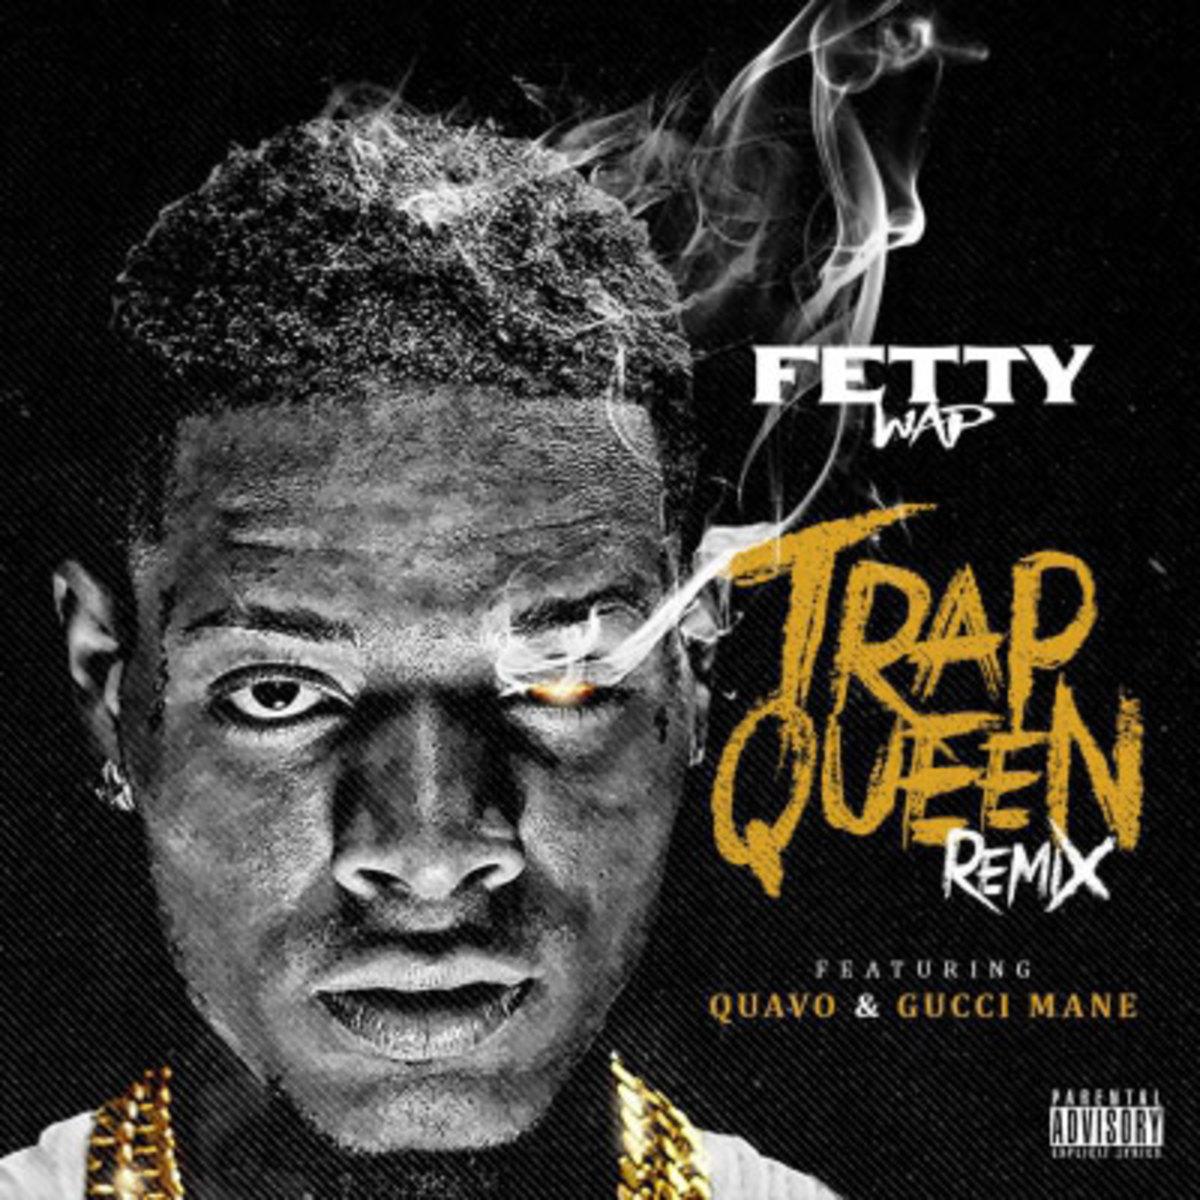 fetty-wap-trap-queen-remix.jpg